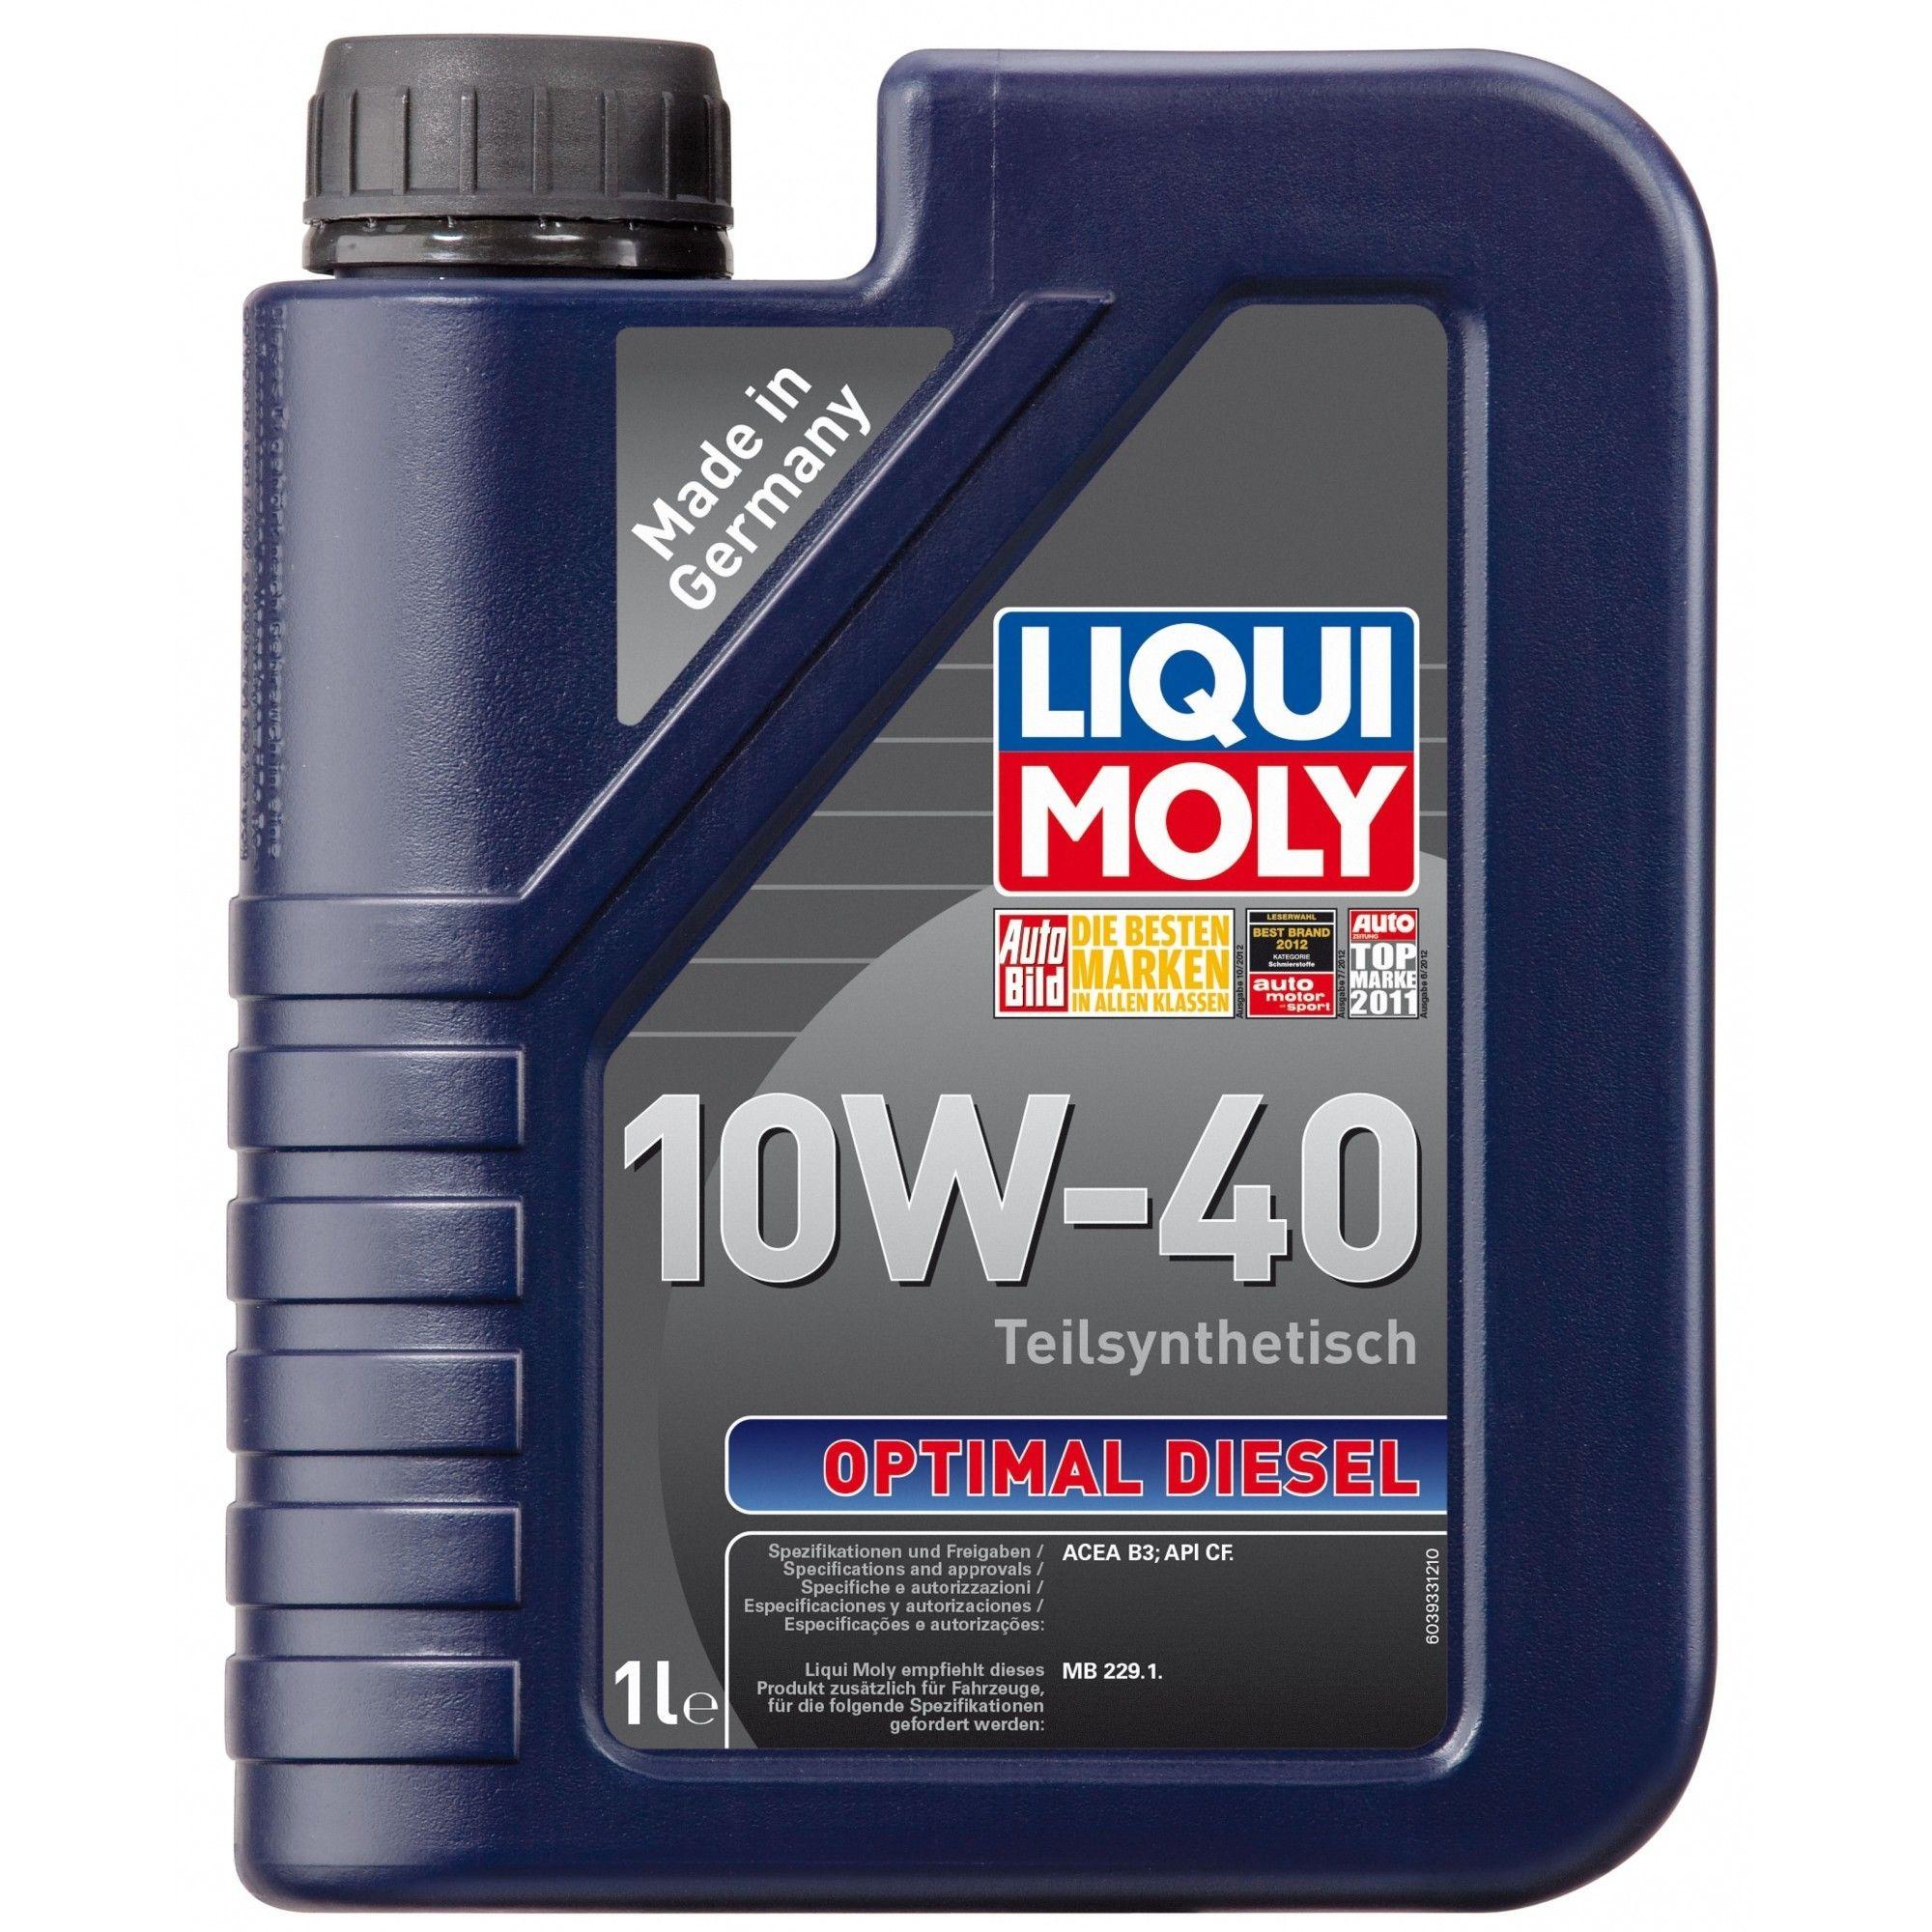 Liqui Moly Optimal Diesel 10W-40 1л